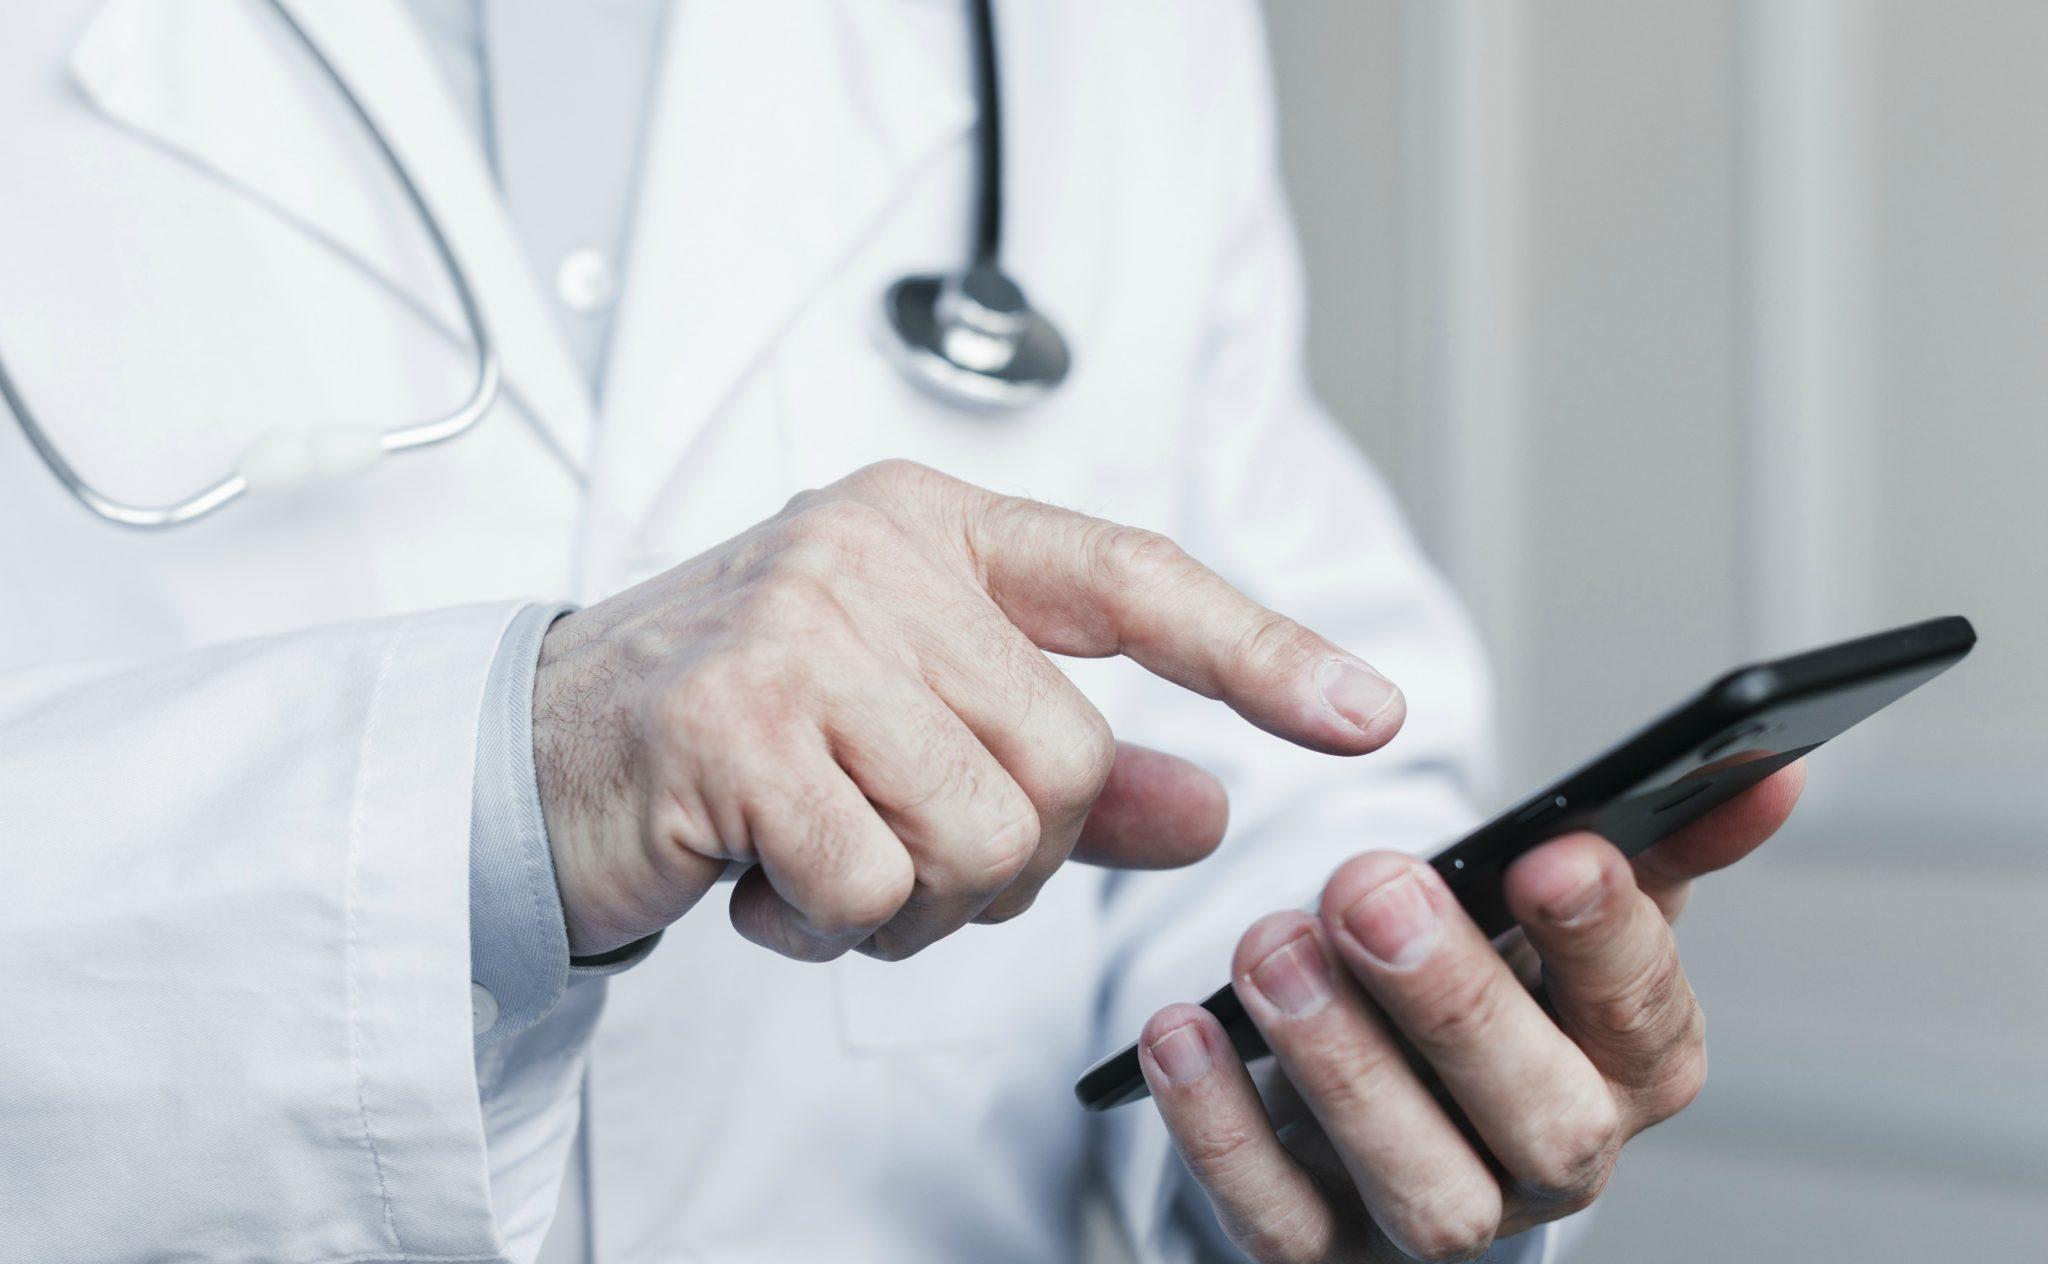 Atendimento médico por WhatsApp